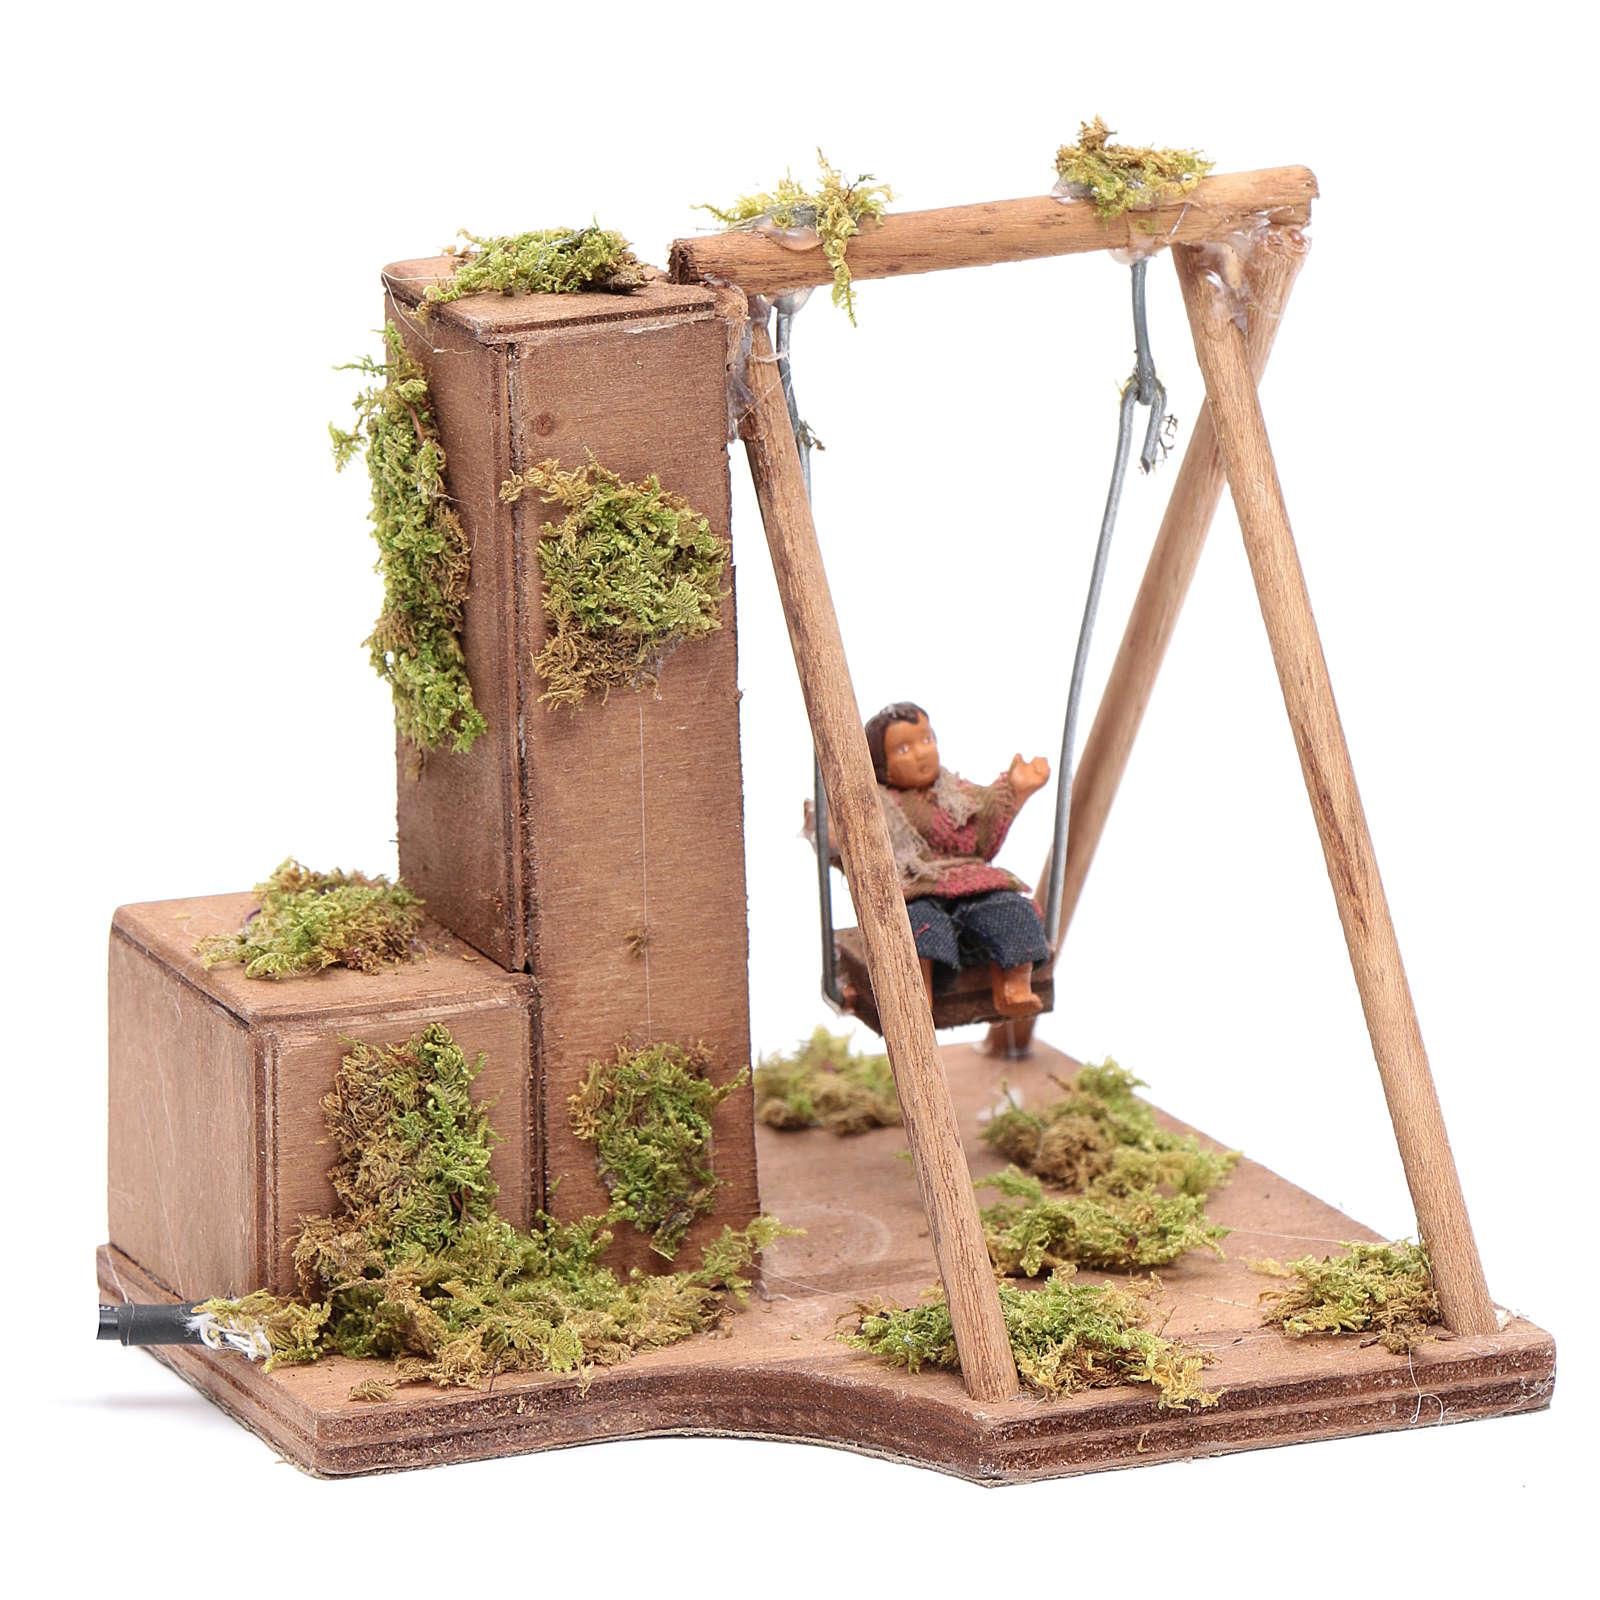 Moving child on a swing 10 cm for Neapolitan nativity scene 4